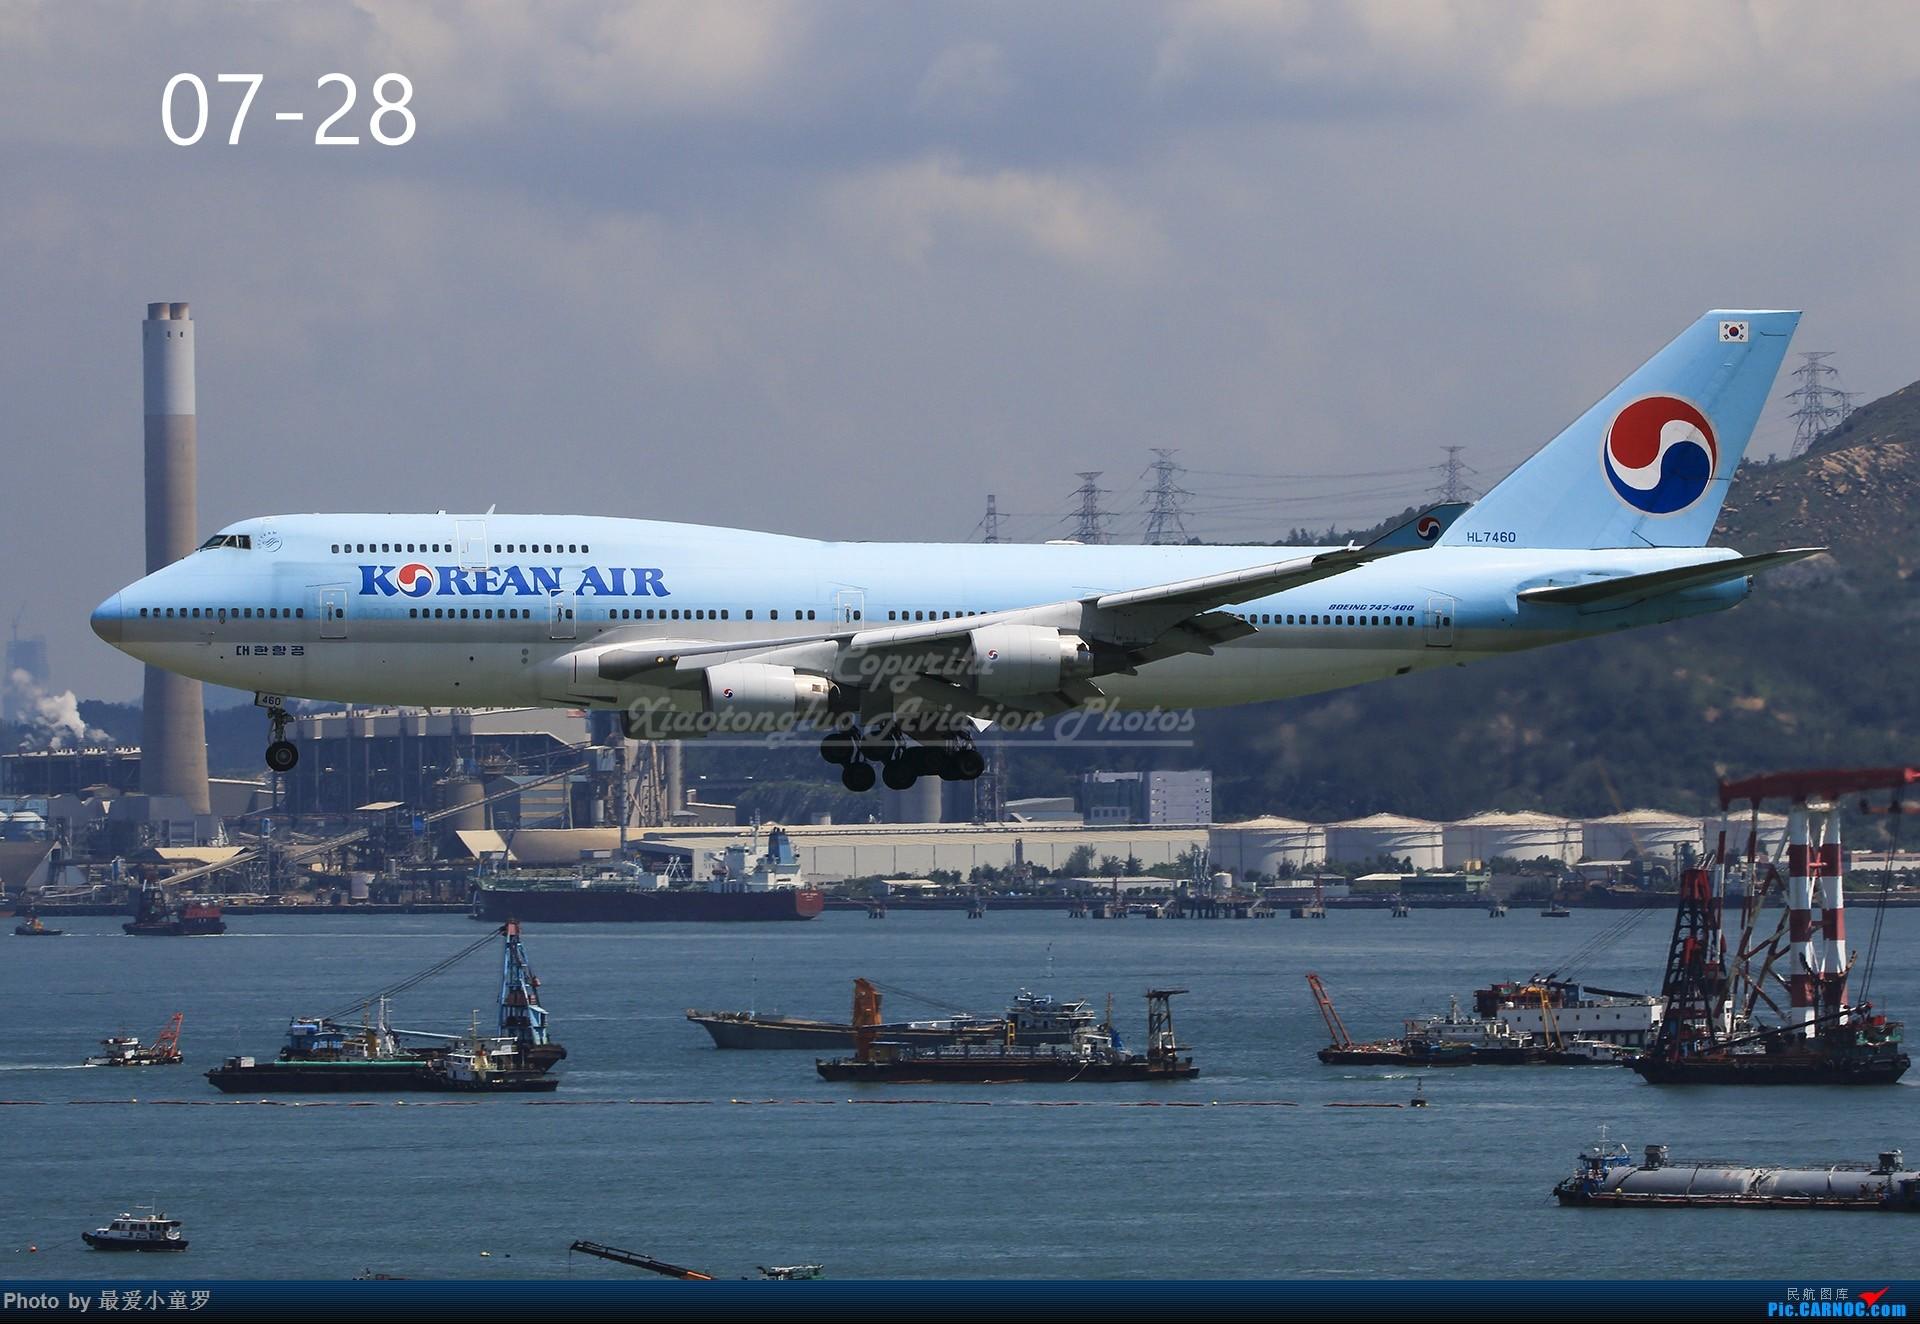 Re:[原创]年底交作业——小童罗的2018年拍机总结 BOEING 747-400 HL7460 中国香港国际机场